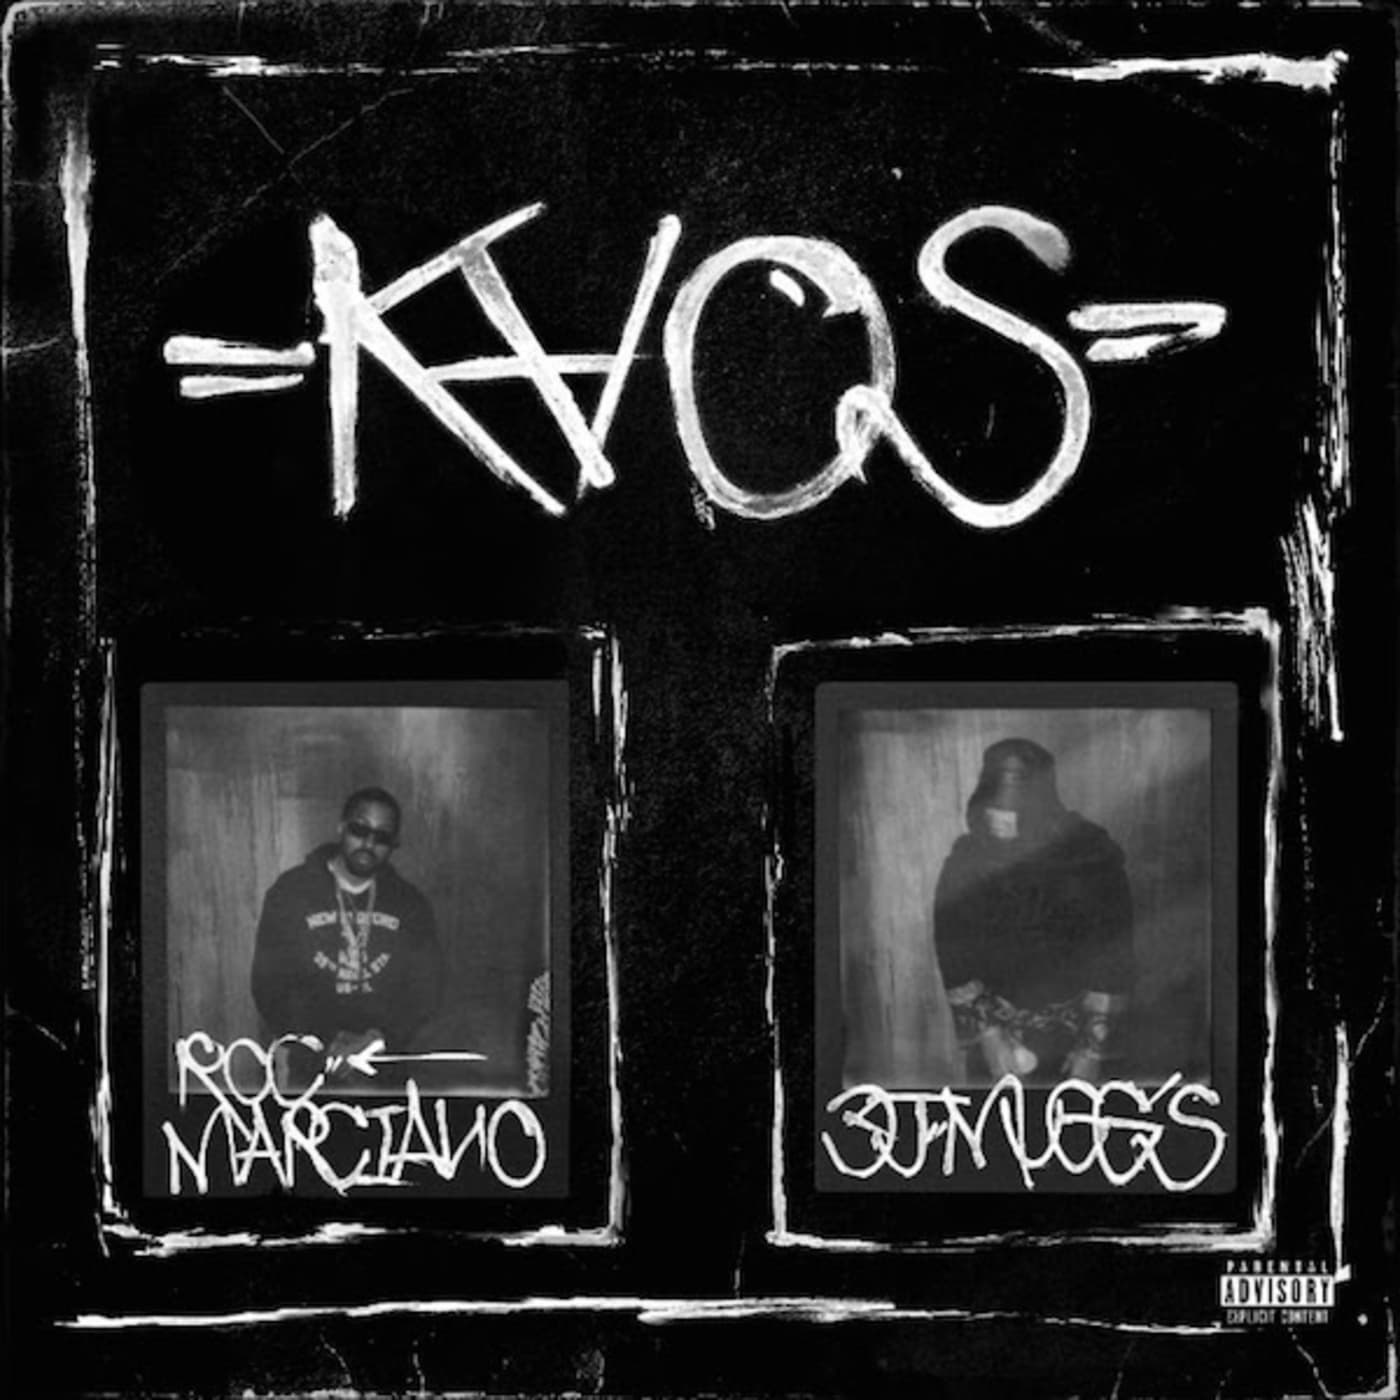 Roc Marciano x DJ Muggs 'Kaos'